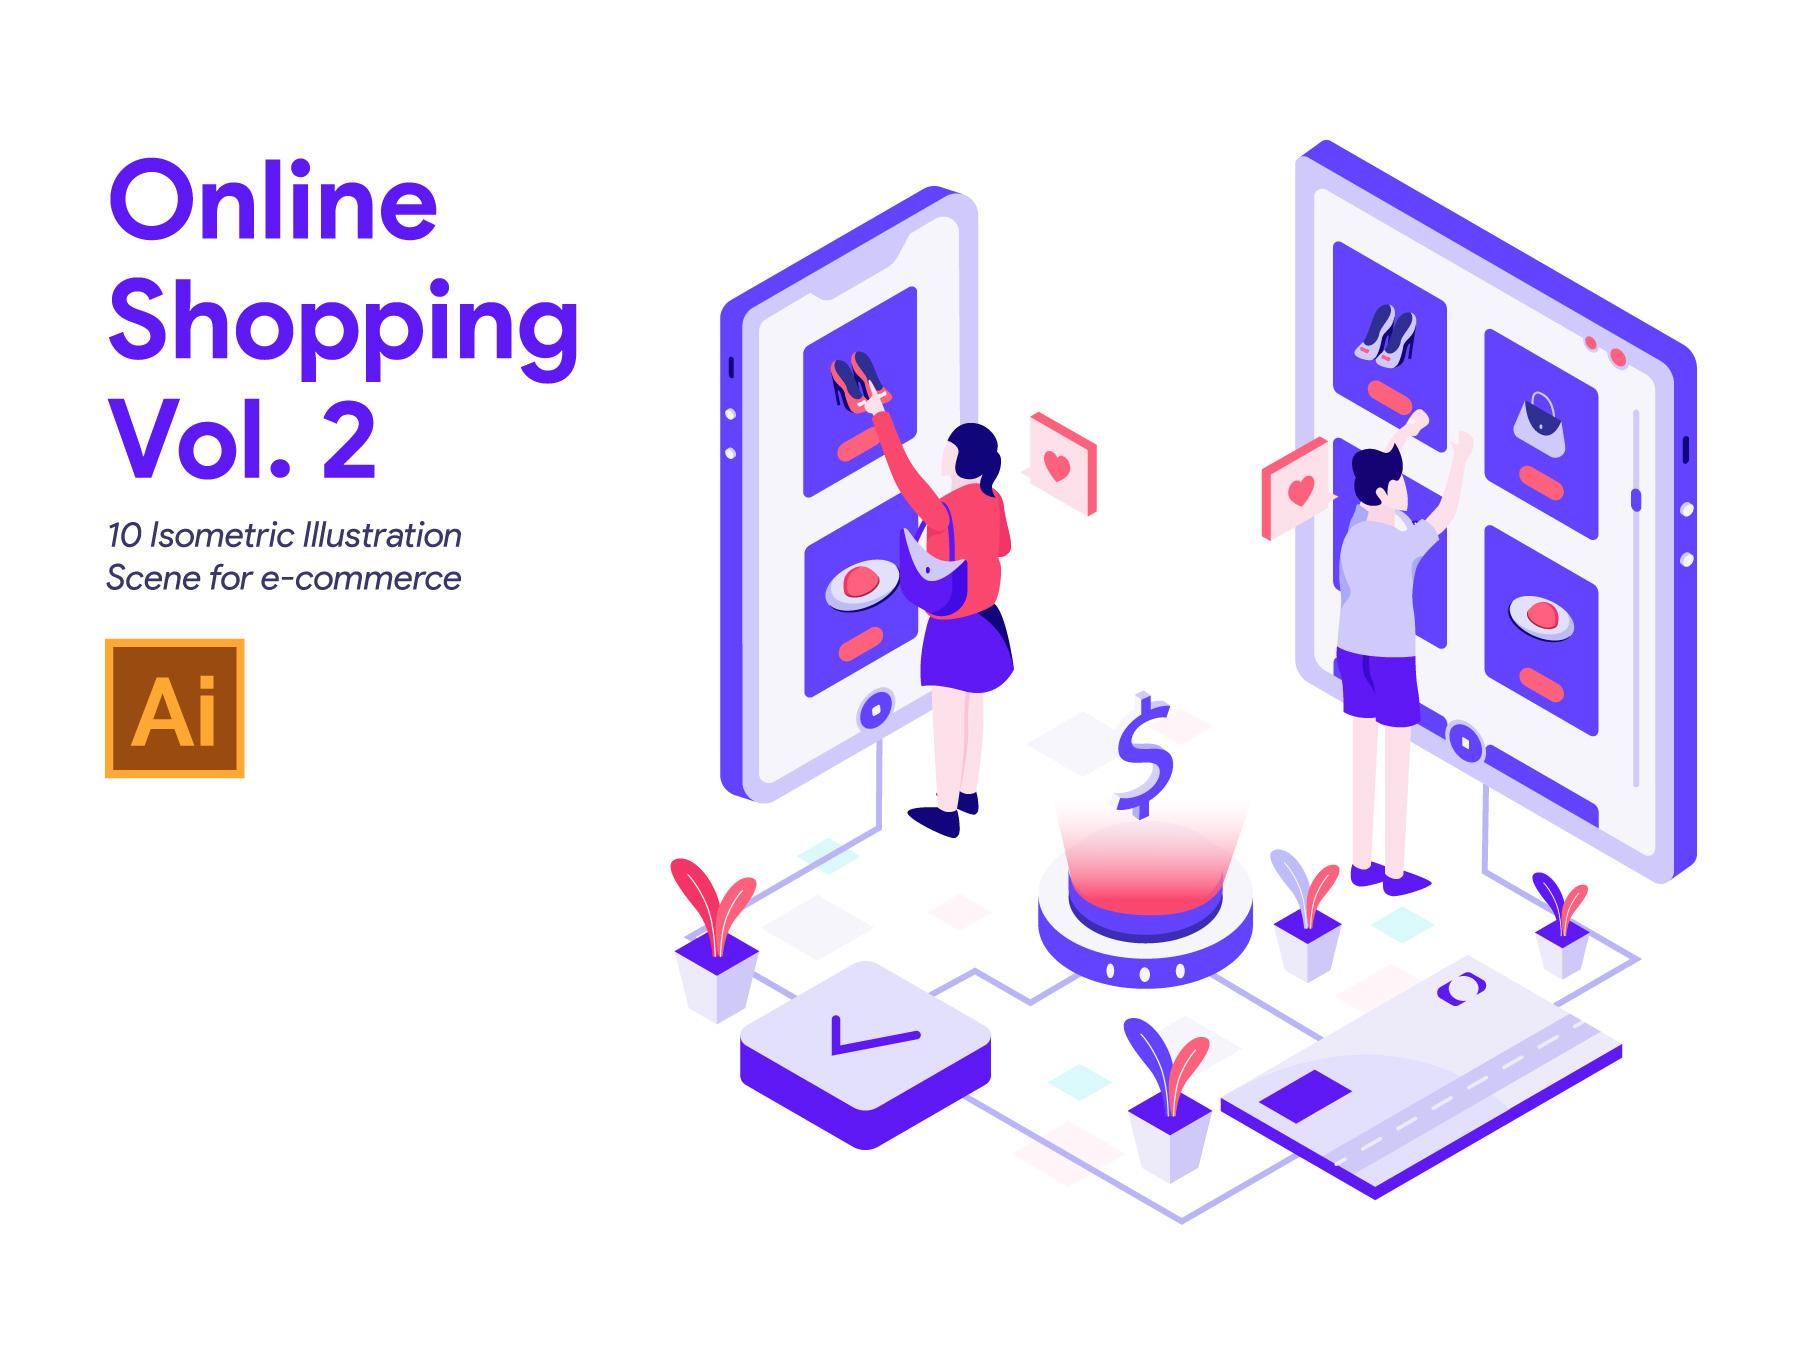 <span class='yzk_title_64593'>电商网购扁平化试了人物场景插画UI设计素材 banner Online Shopping Vol 2</span>